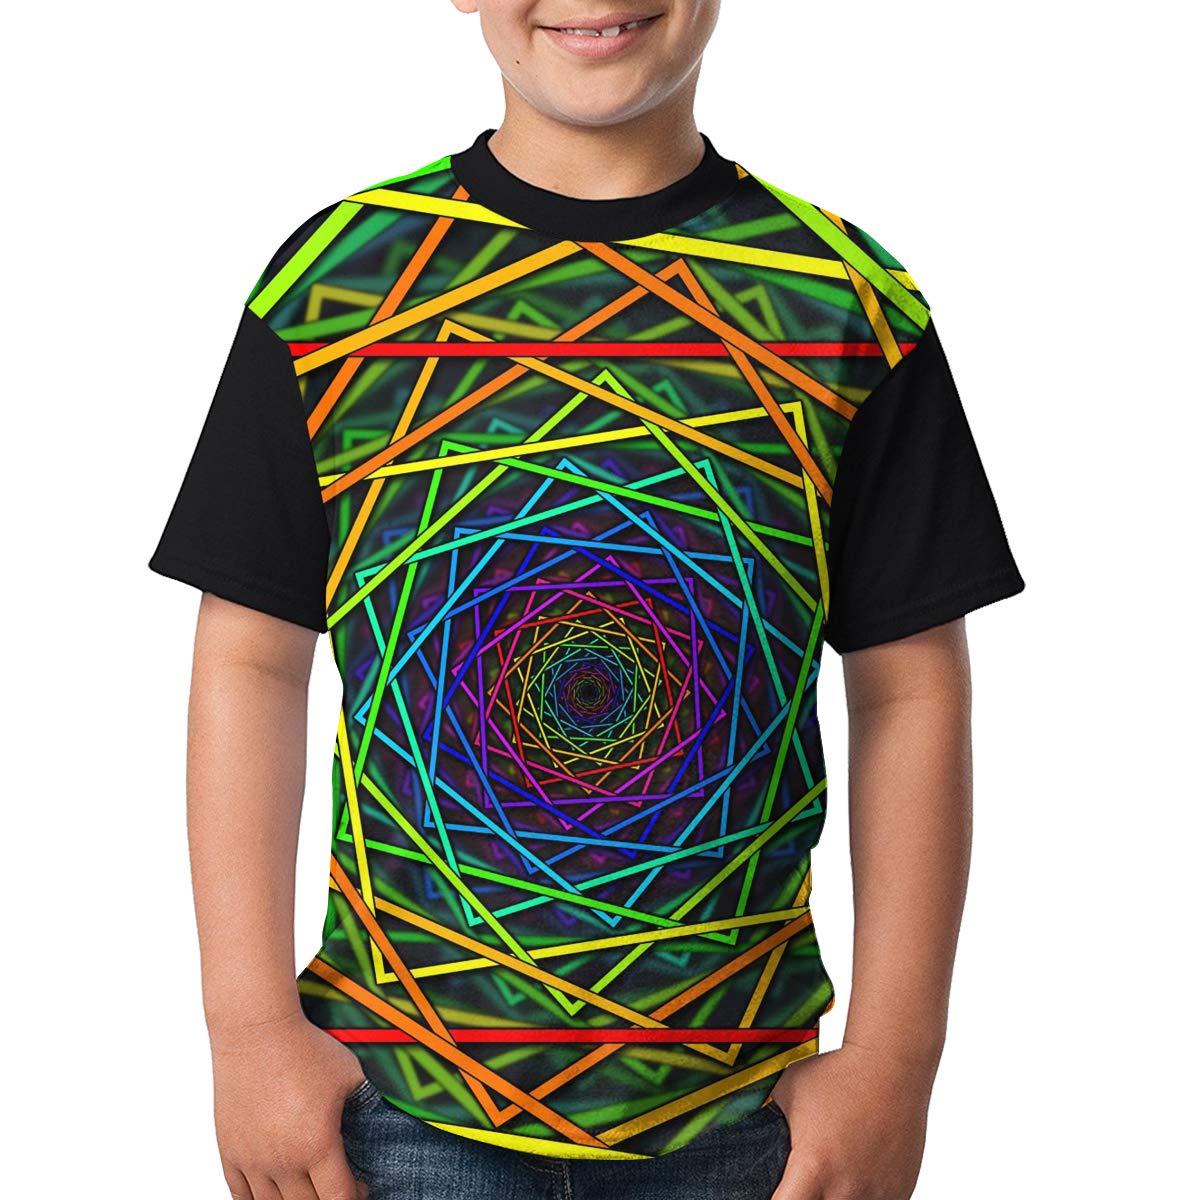 Toomny Boys Colorful Short Sleeve T-Shirt